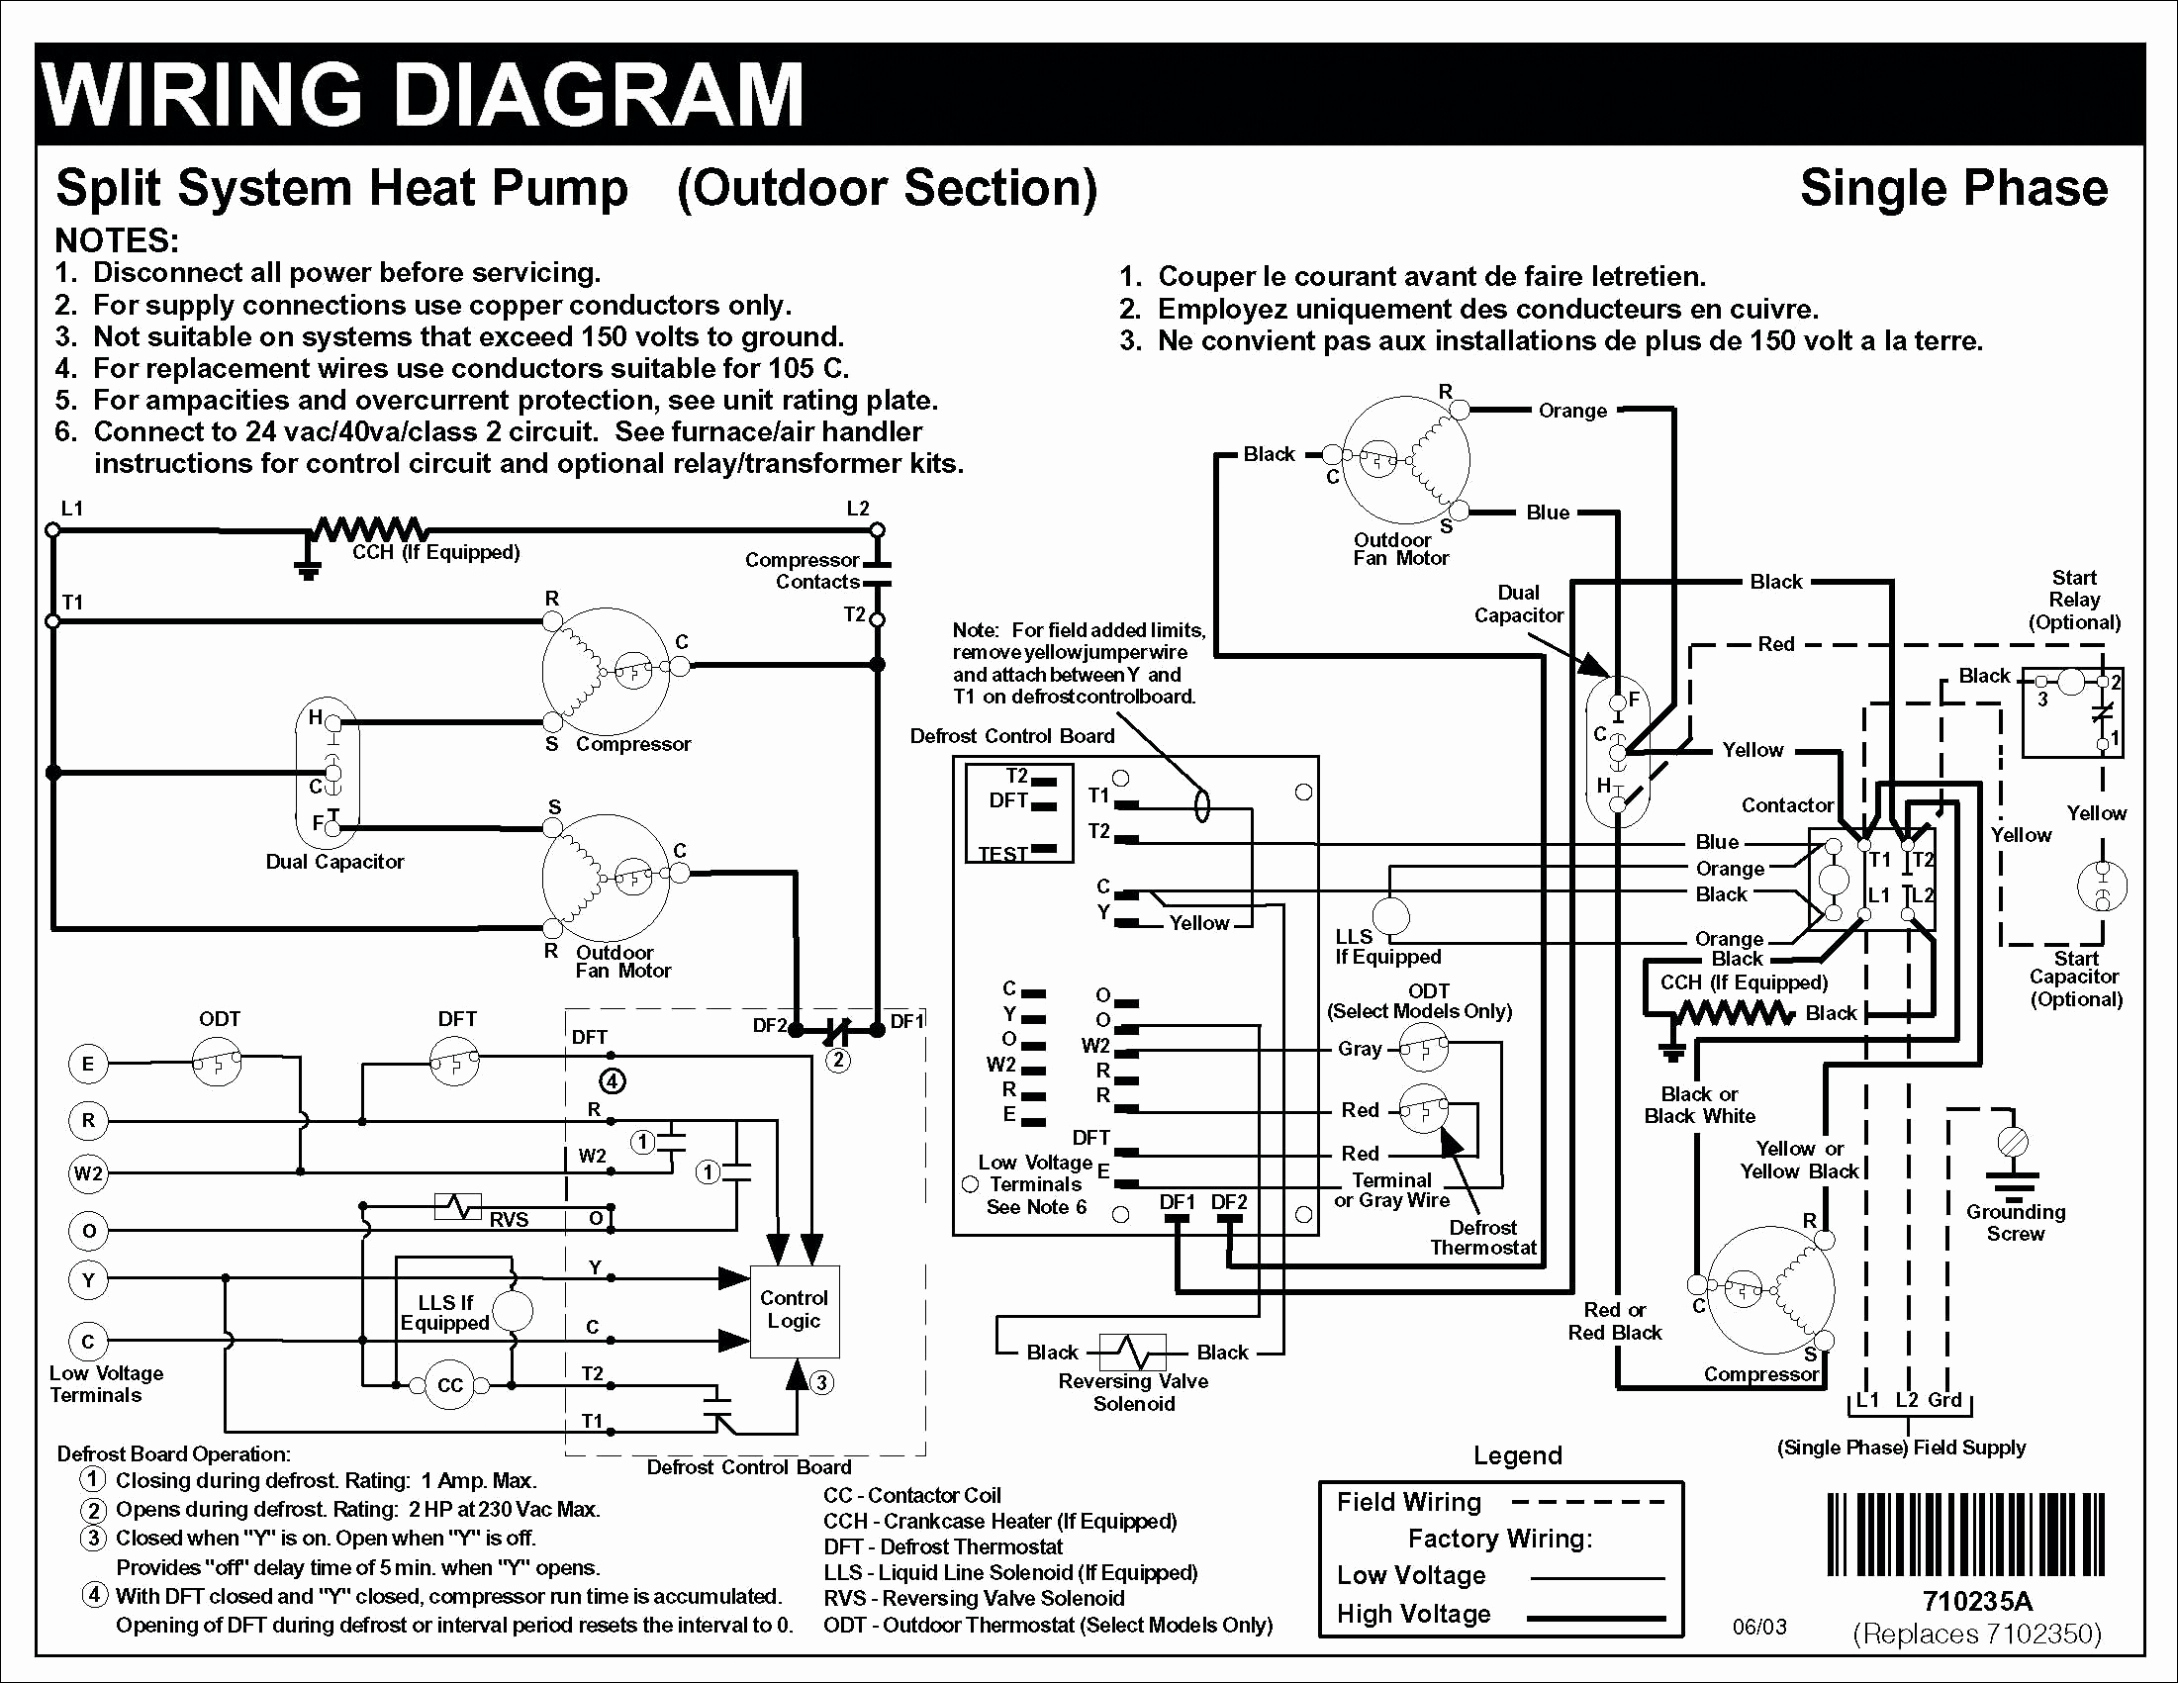 Pioneer Fh X700Bt Wiring Diagram | Wiring Diagram - Pioneer Fh X720Bt Wiring Diagram